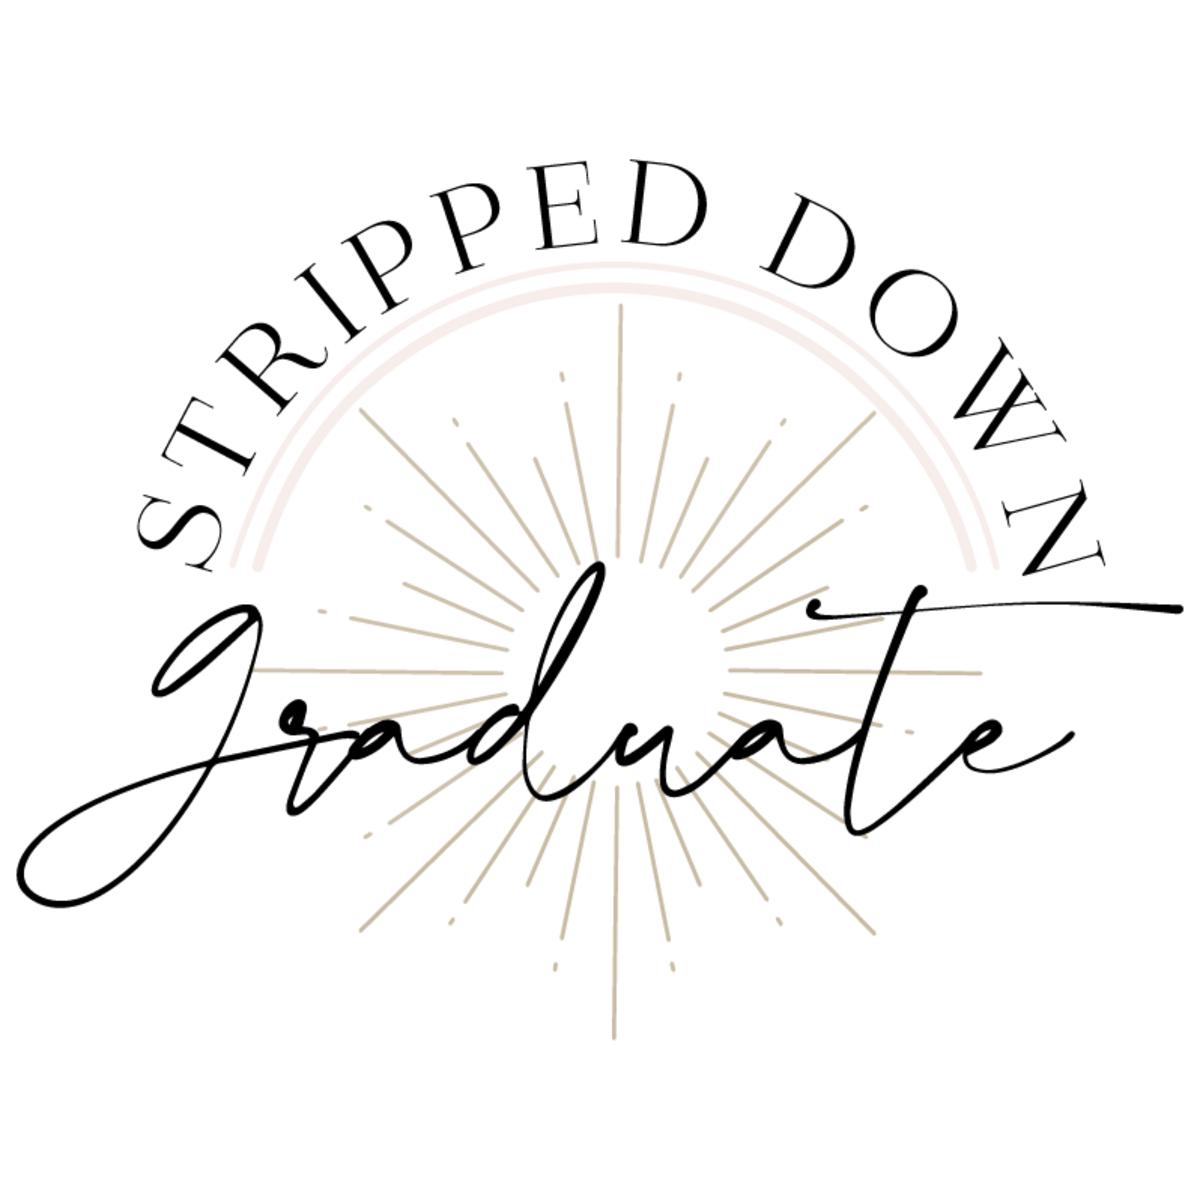 Stripped Down Graduate Badge WB